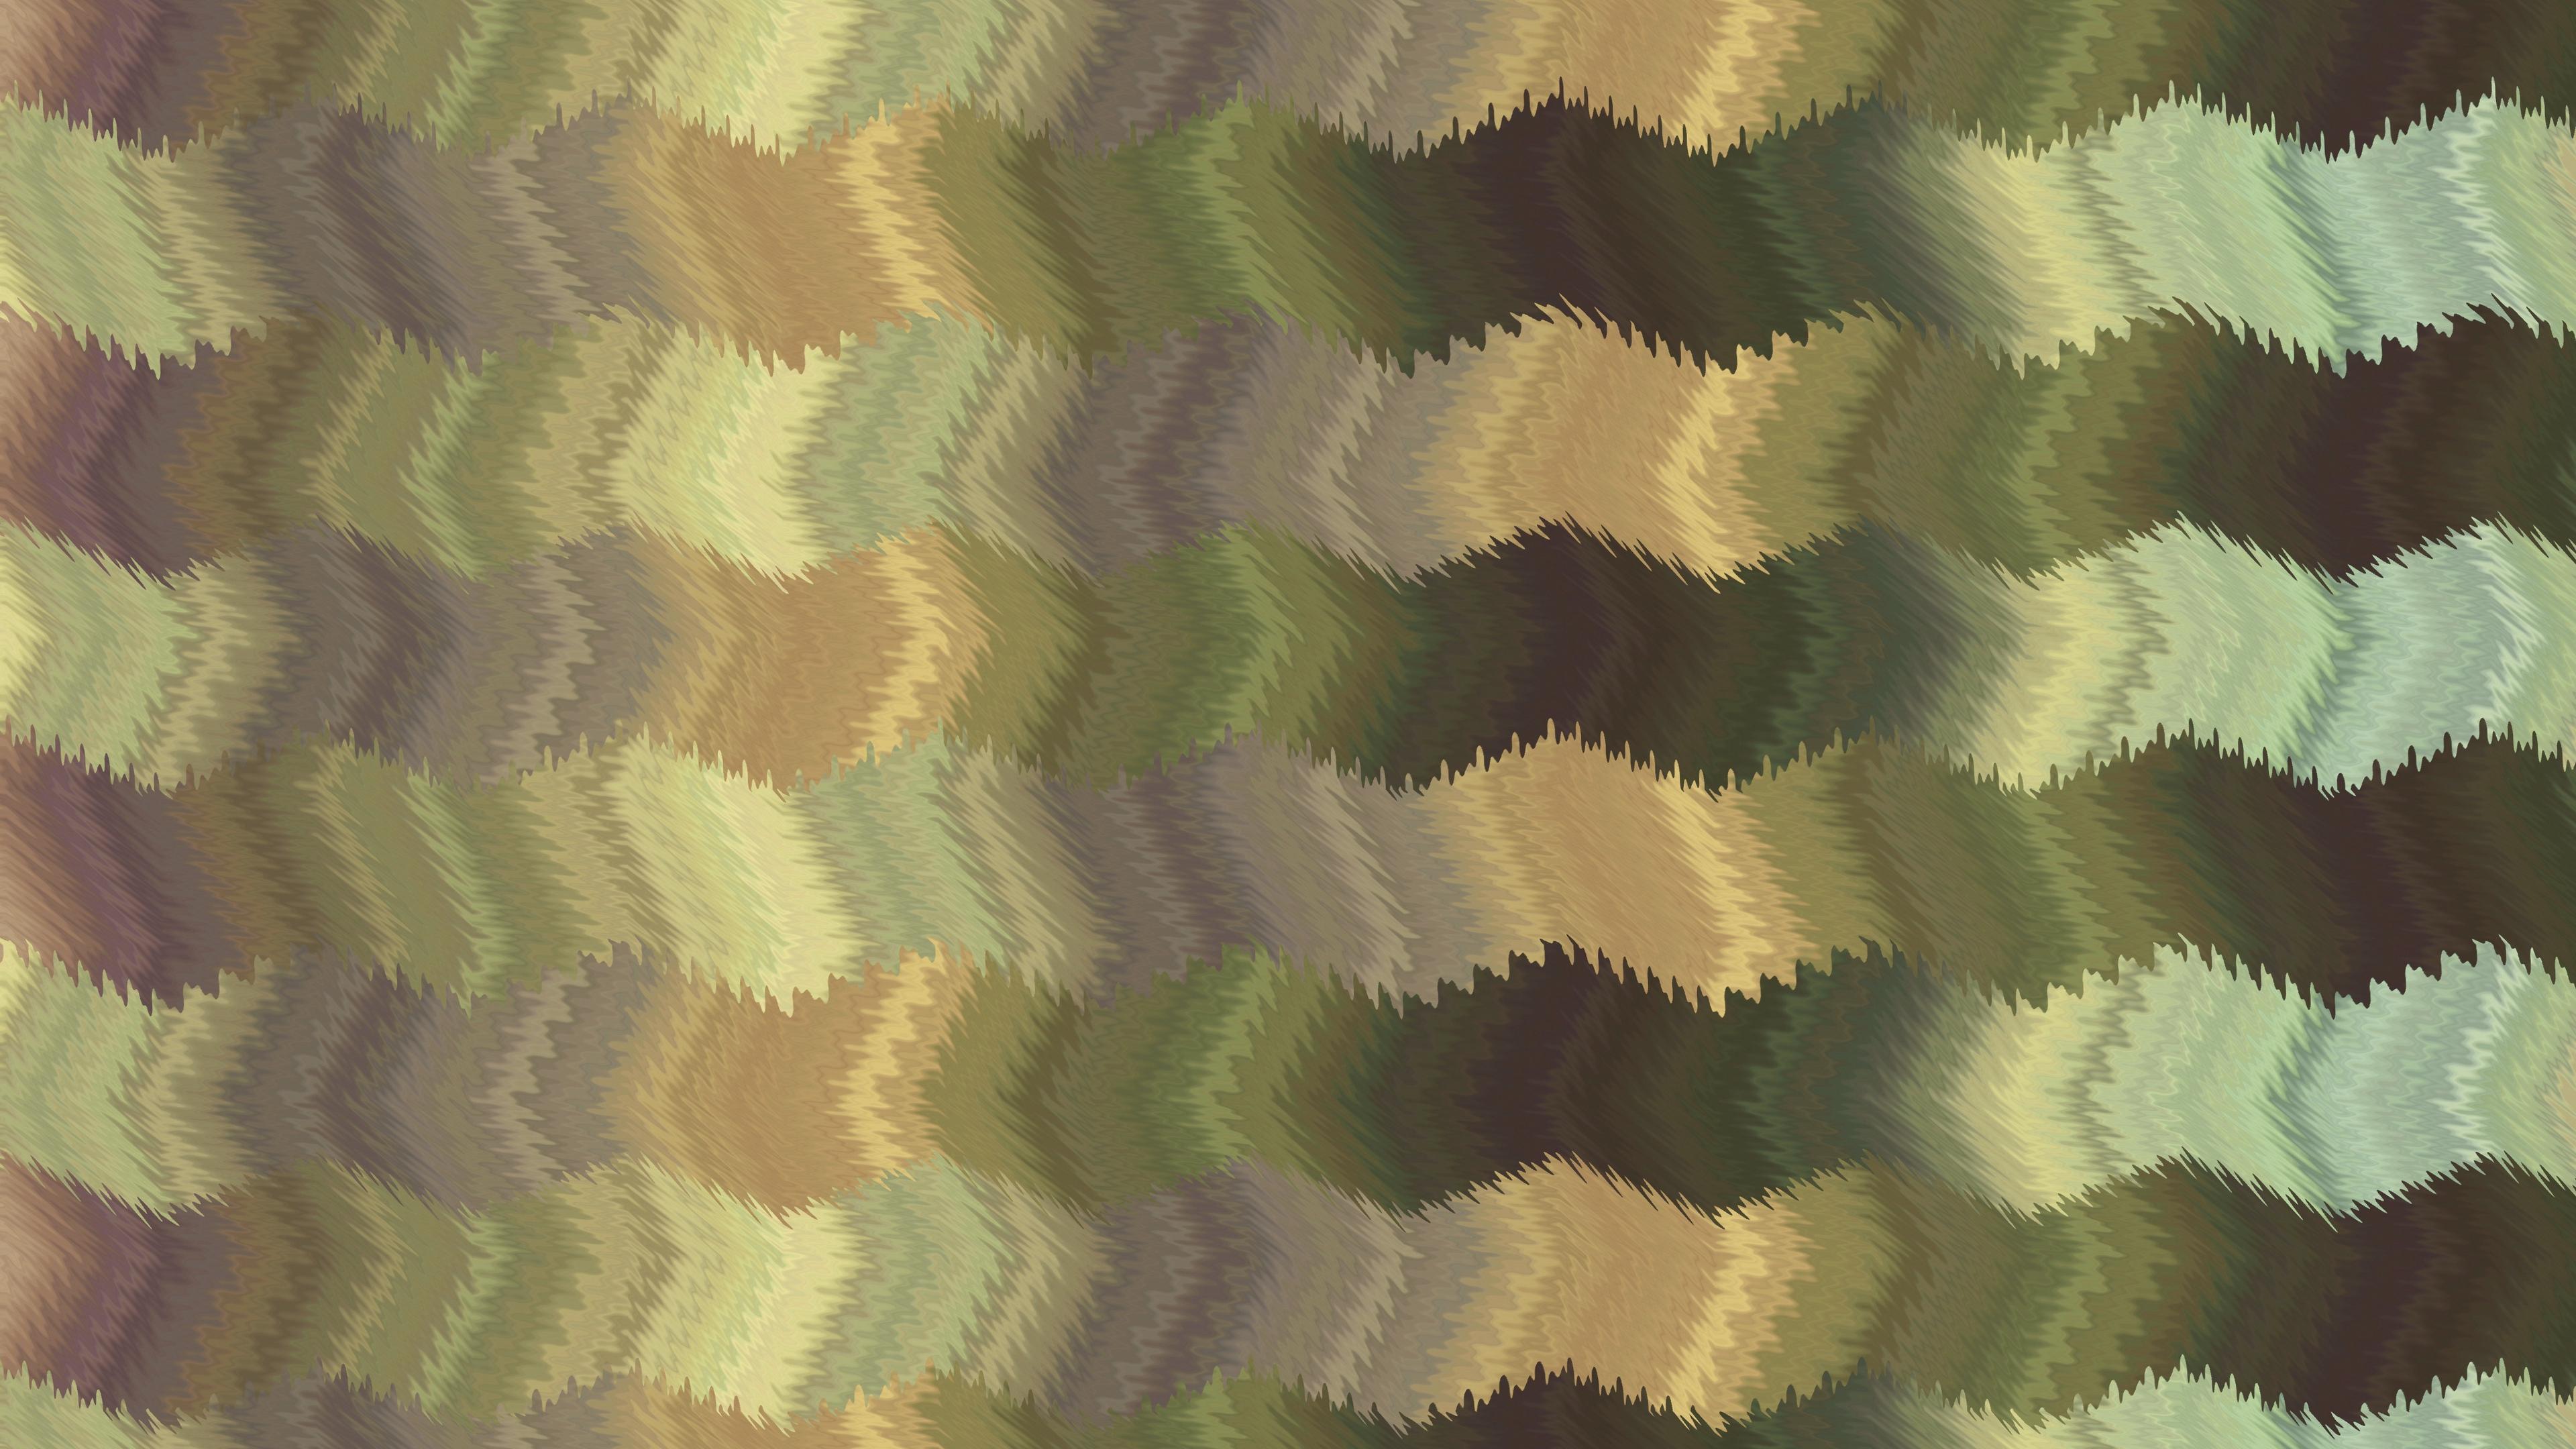 lines wavy shine 4k 1539369757 - lines, wavy, shine 4k - wavy, Shine, Lines